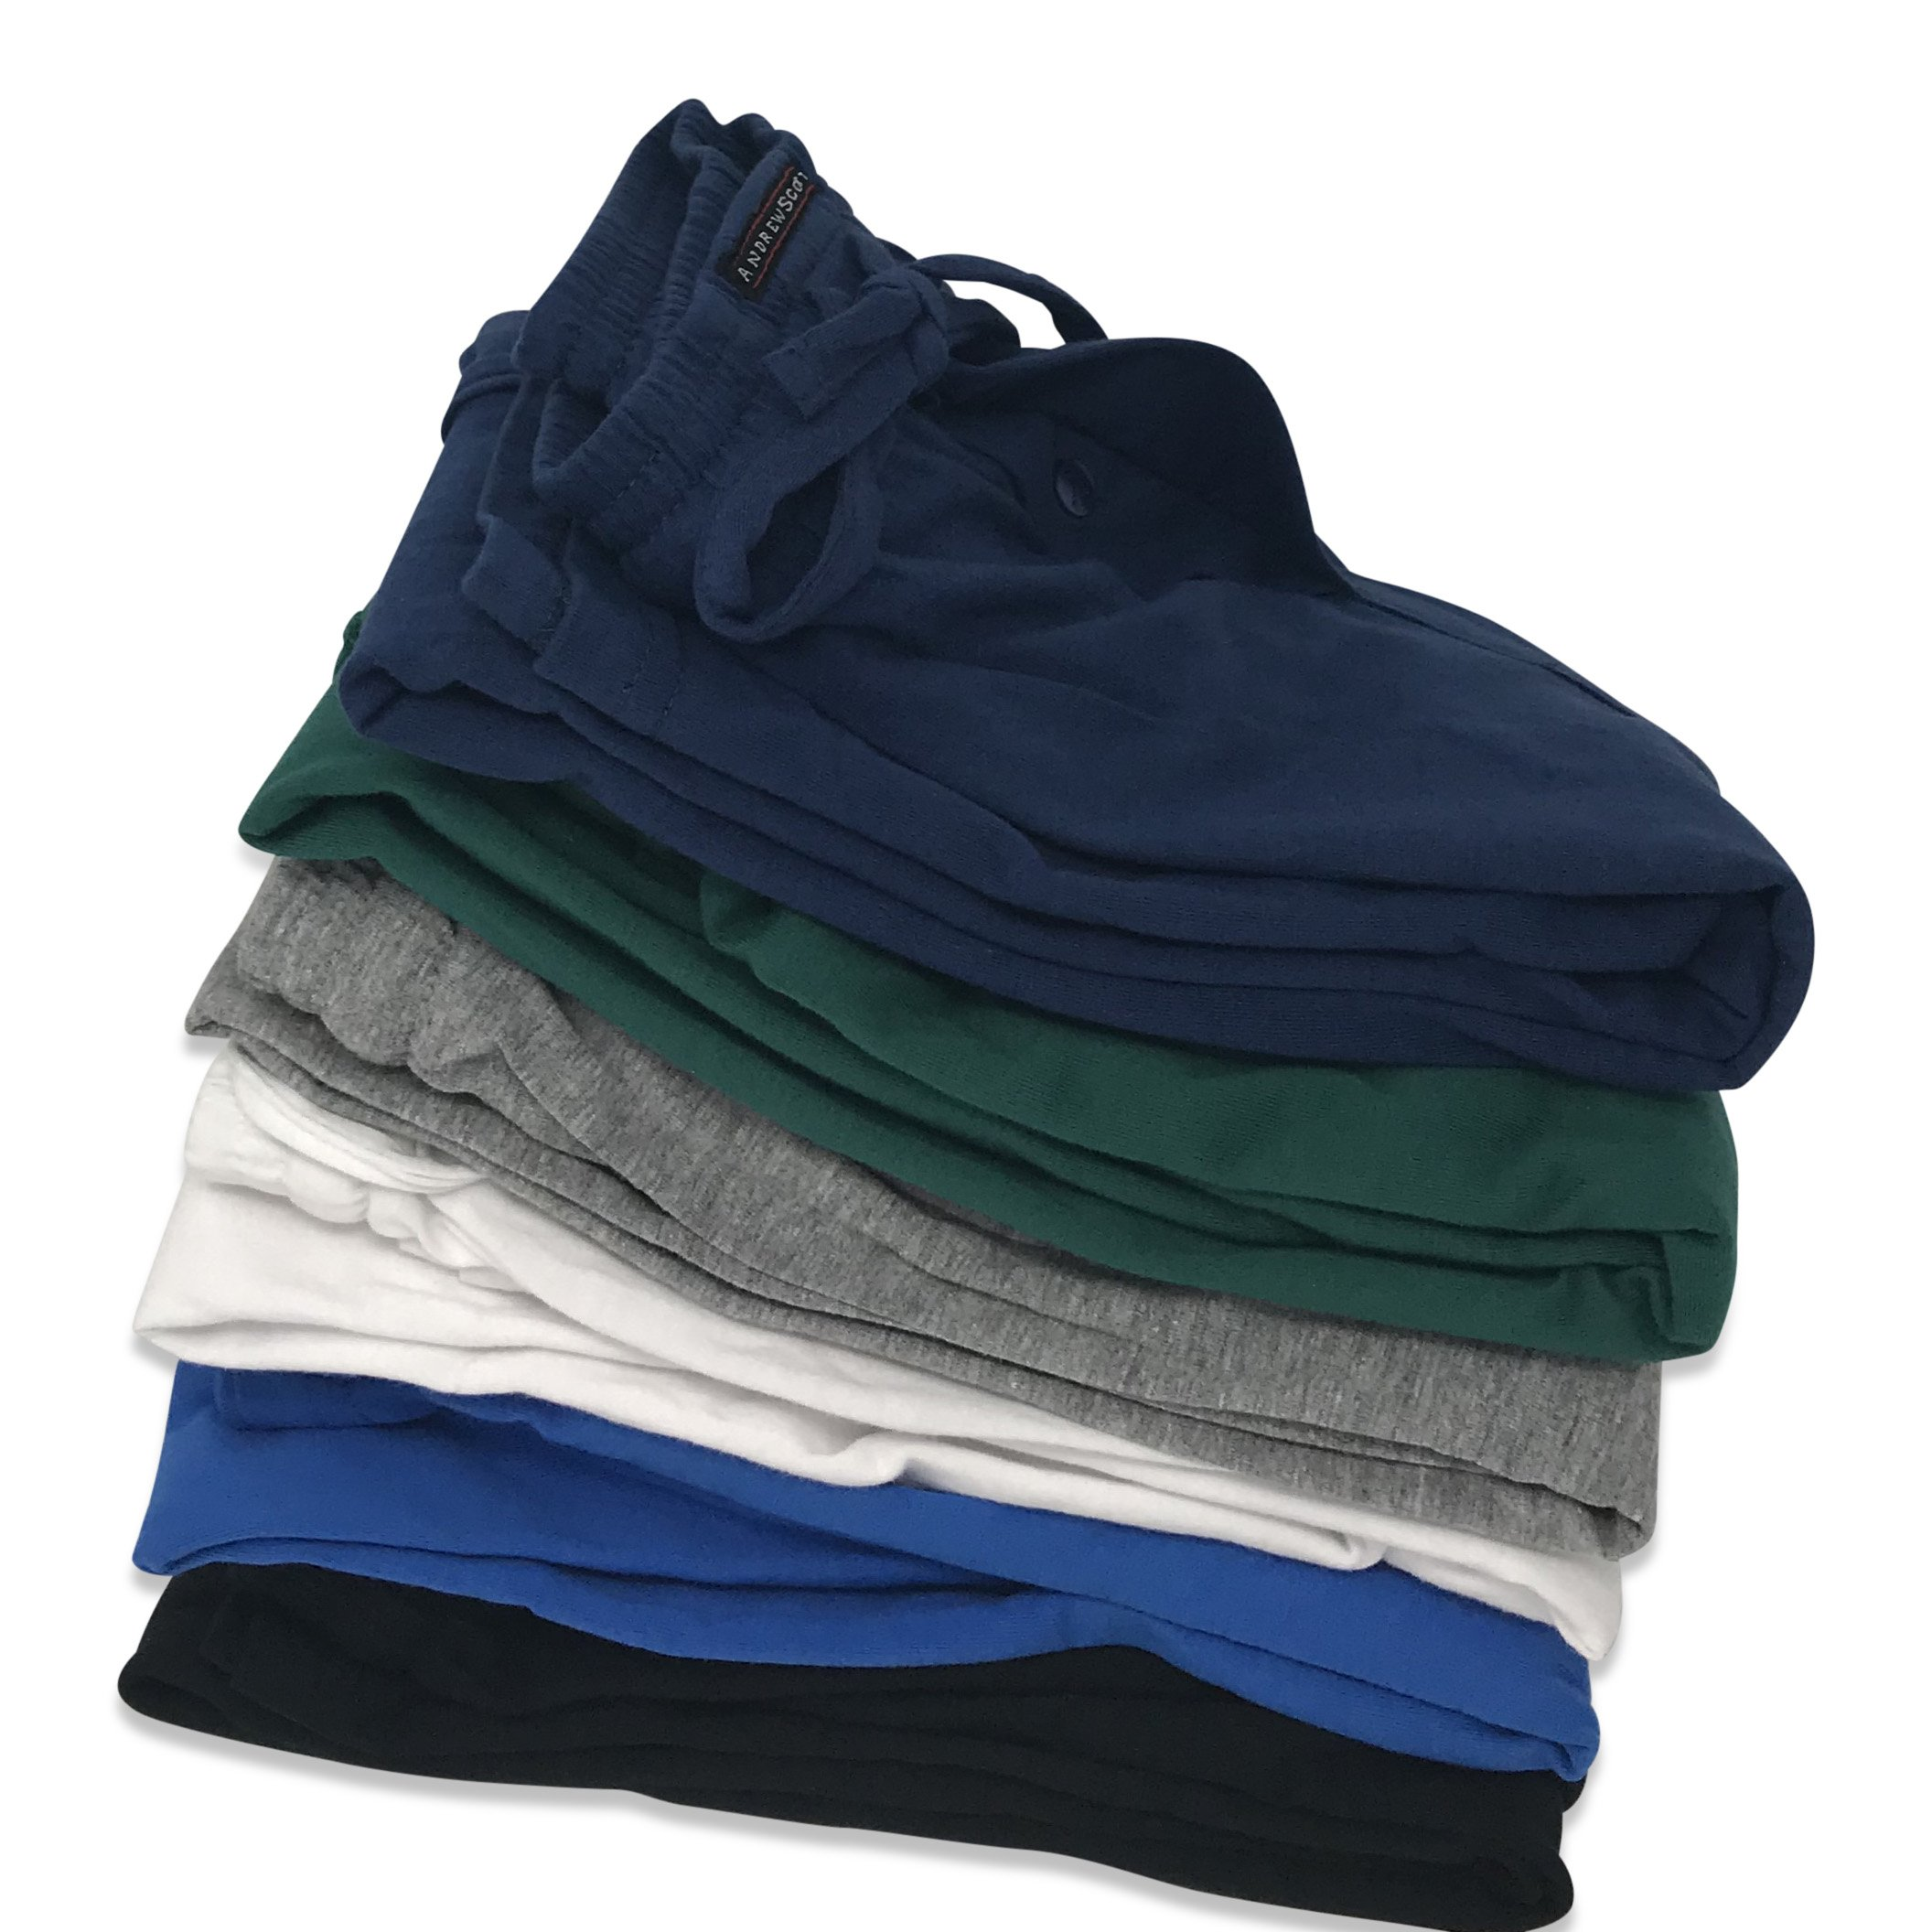 Andrew Scott Men's 6 Pack 100% Cotton Jersey Knit Yoga Lounge & Sleep Pajama Pants (6 Pack - Navy/Black/Royal/Hunter/White/Grey, Medium) by Andrew Scott (Image #3)